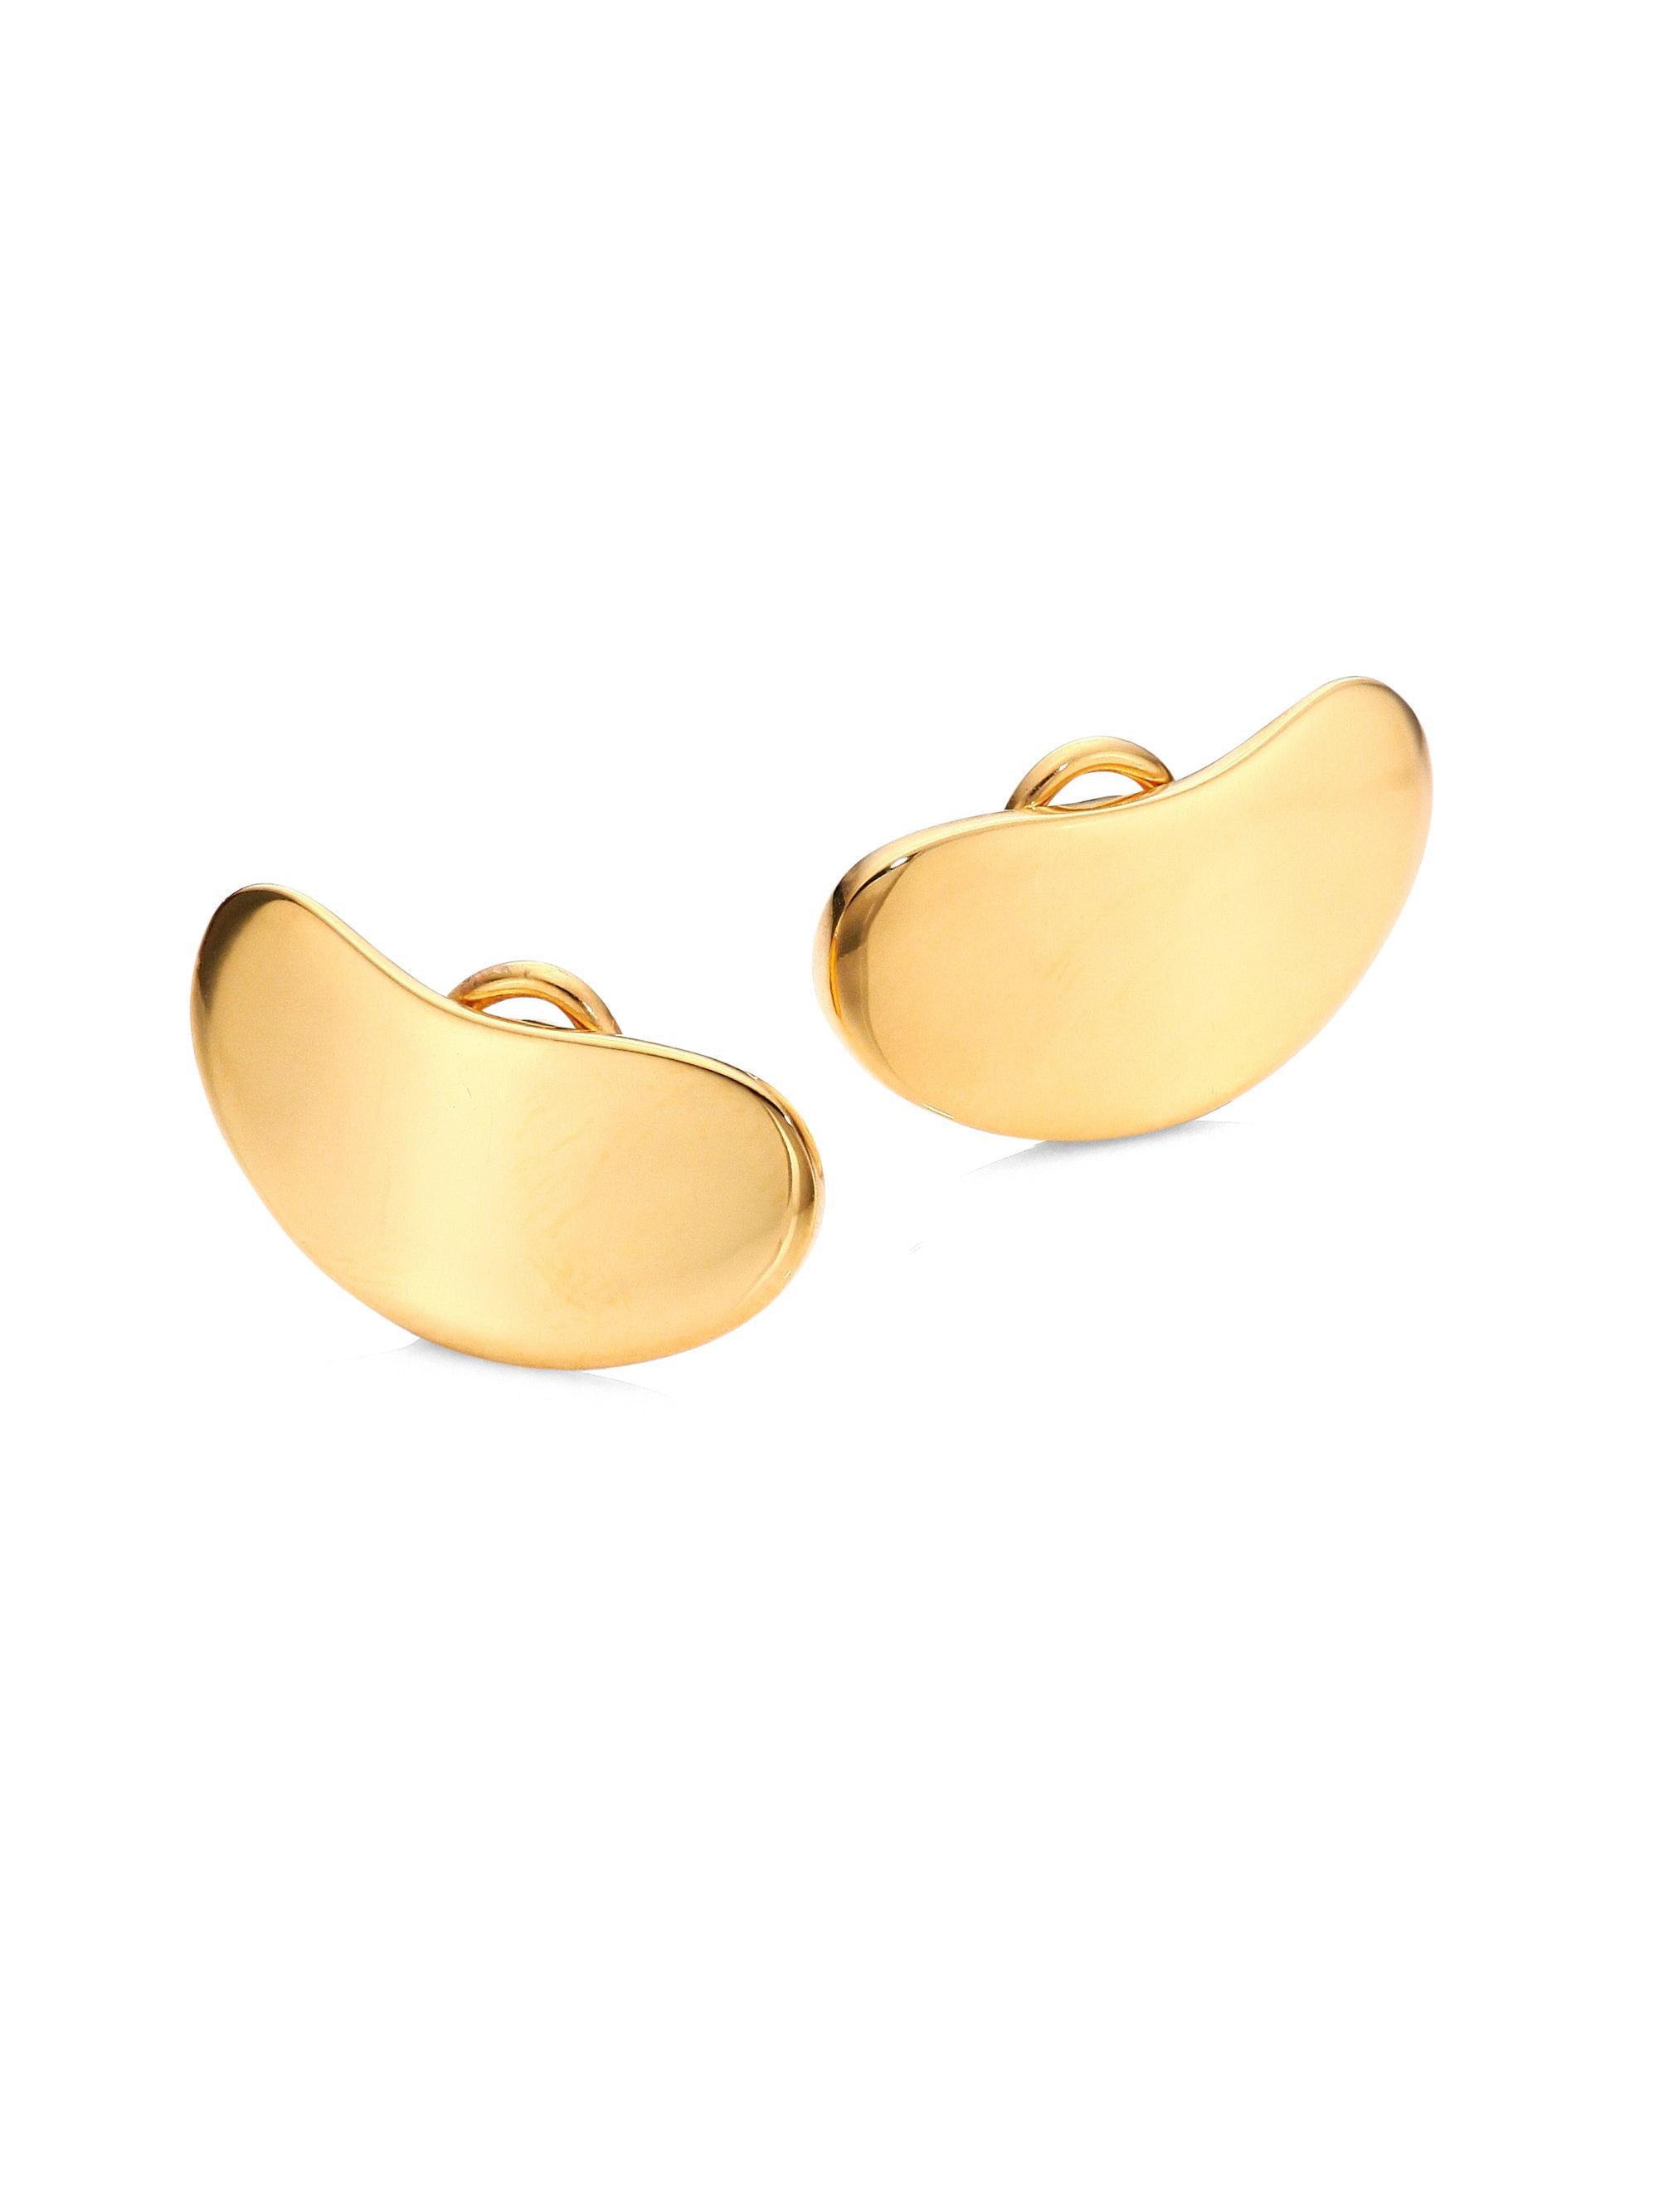 Charlotte Chesnais Nues clip earrings - Metallic xBtmF8QMgm